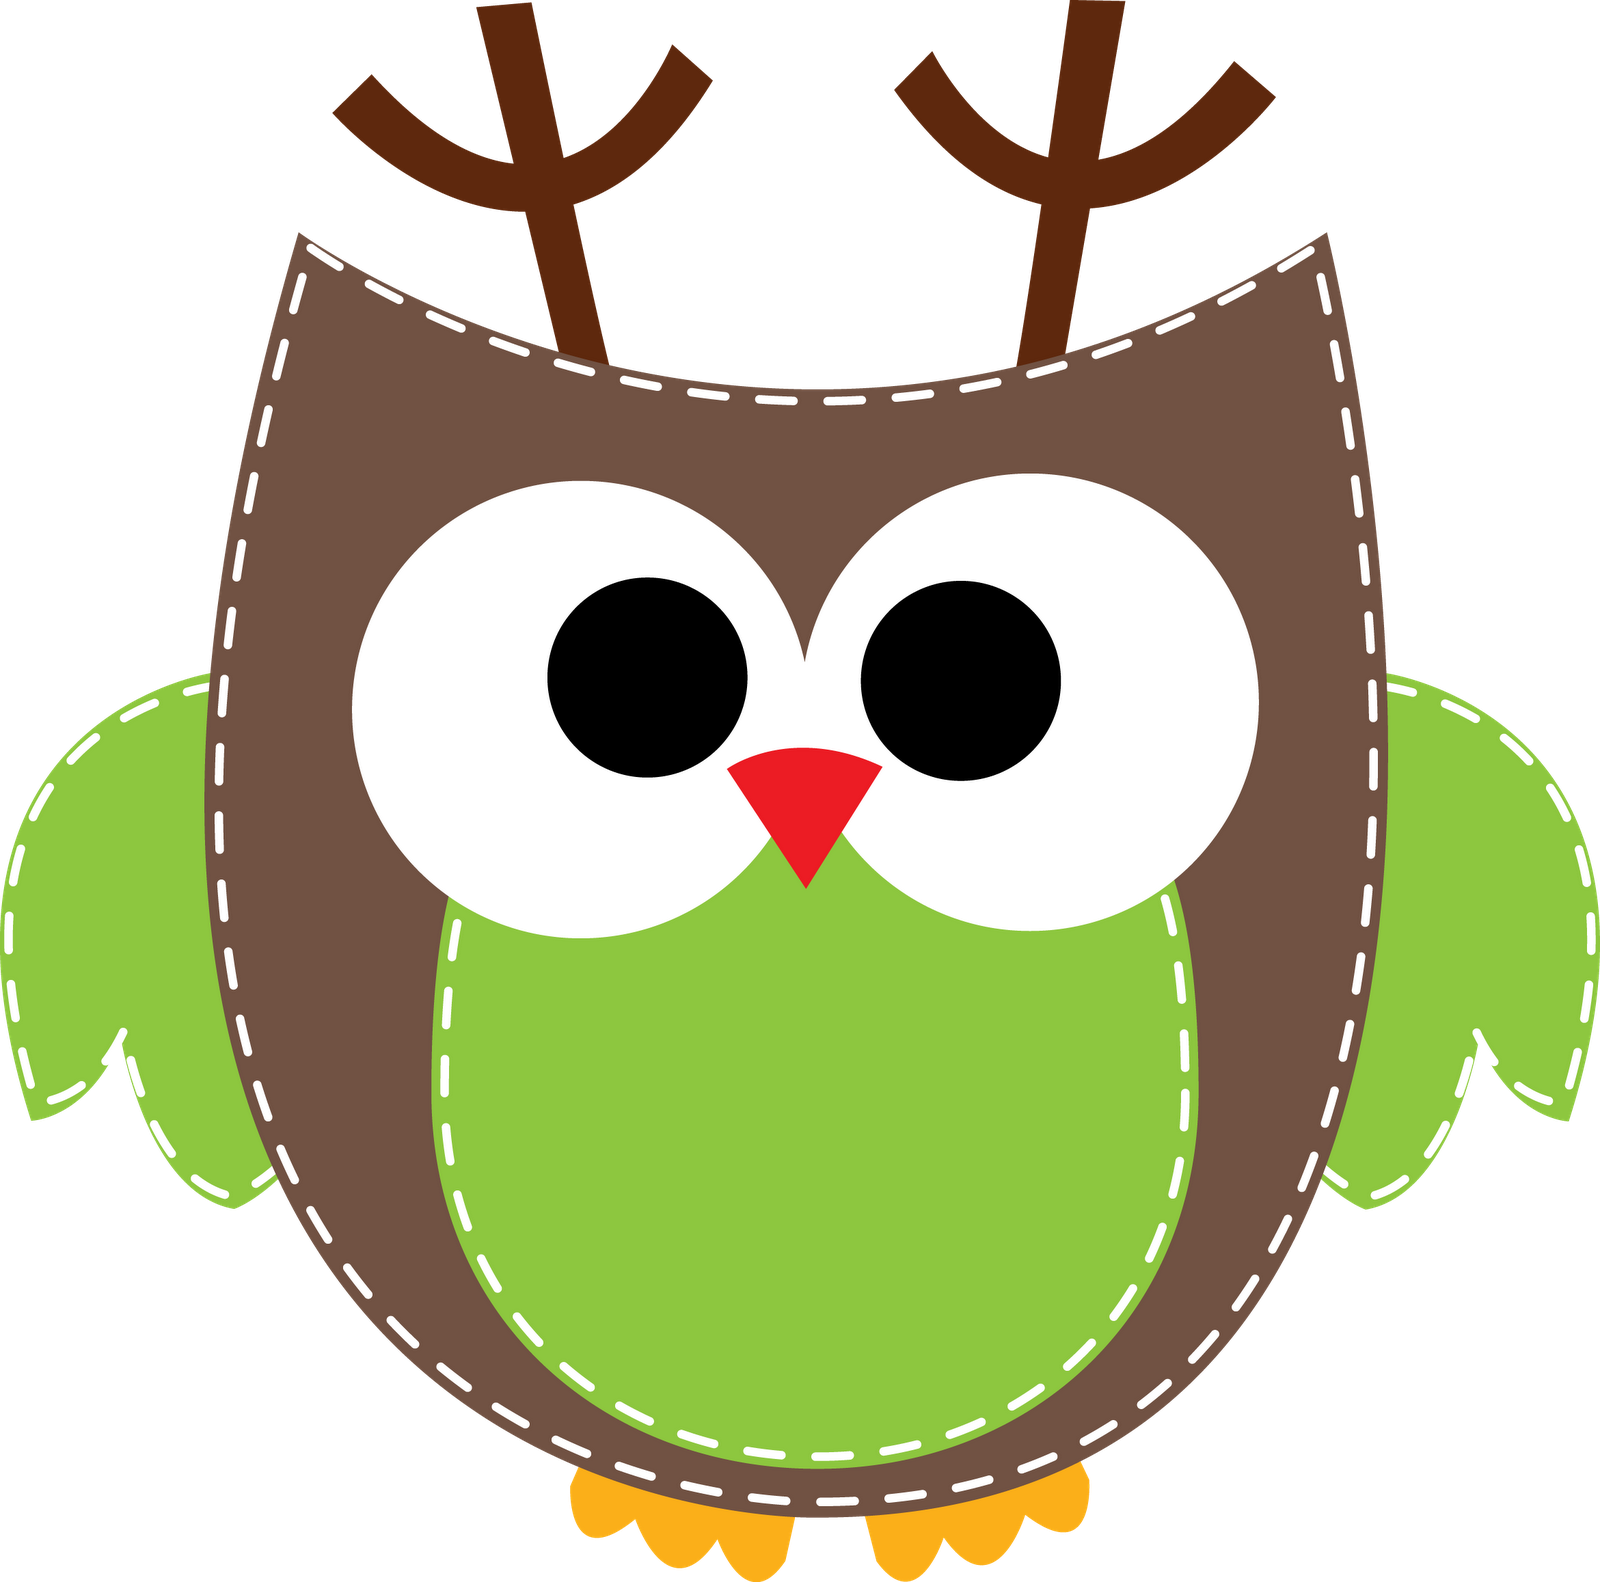 July clipart owl. Social studies teacher panda